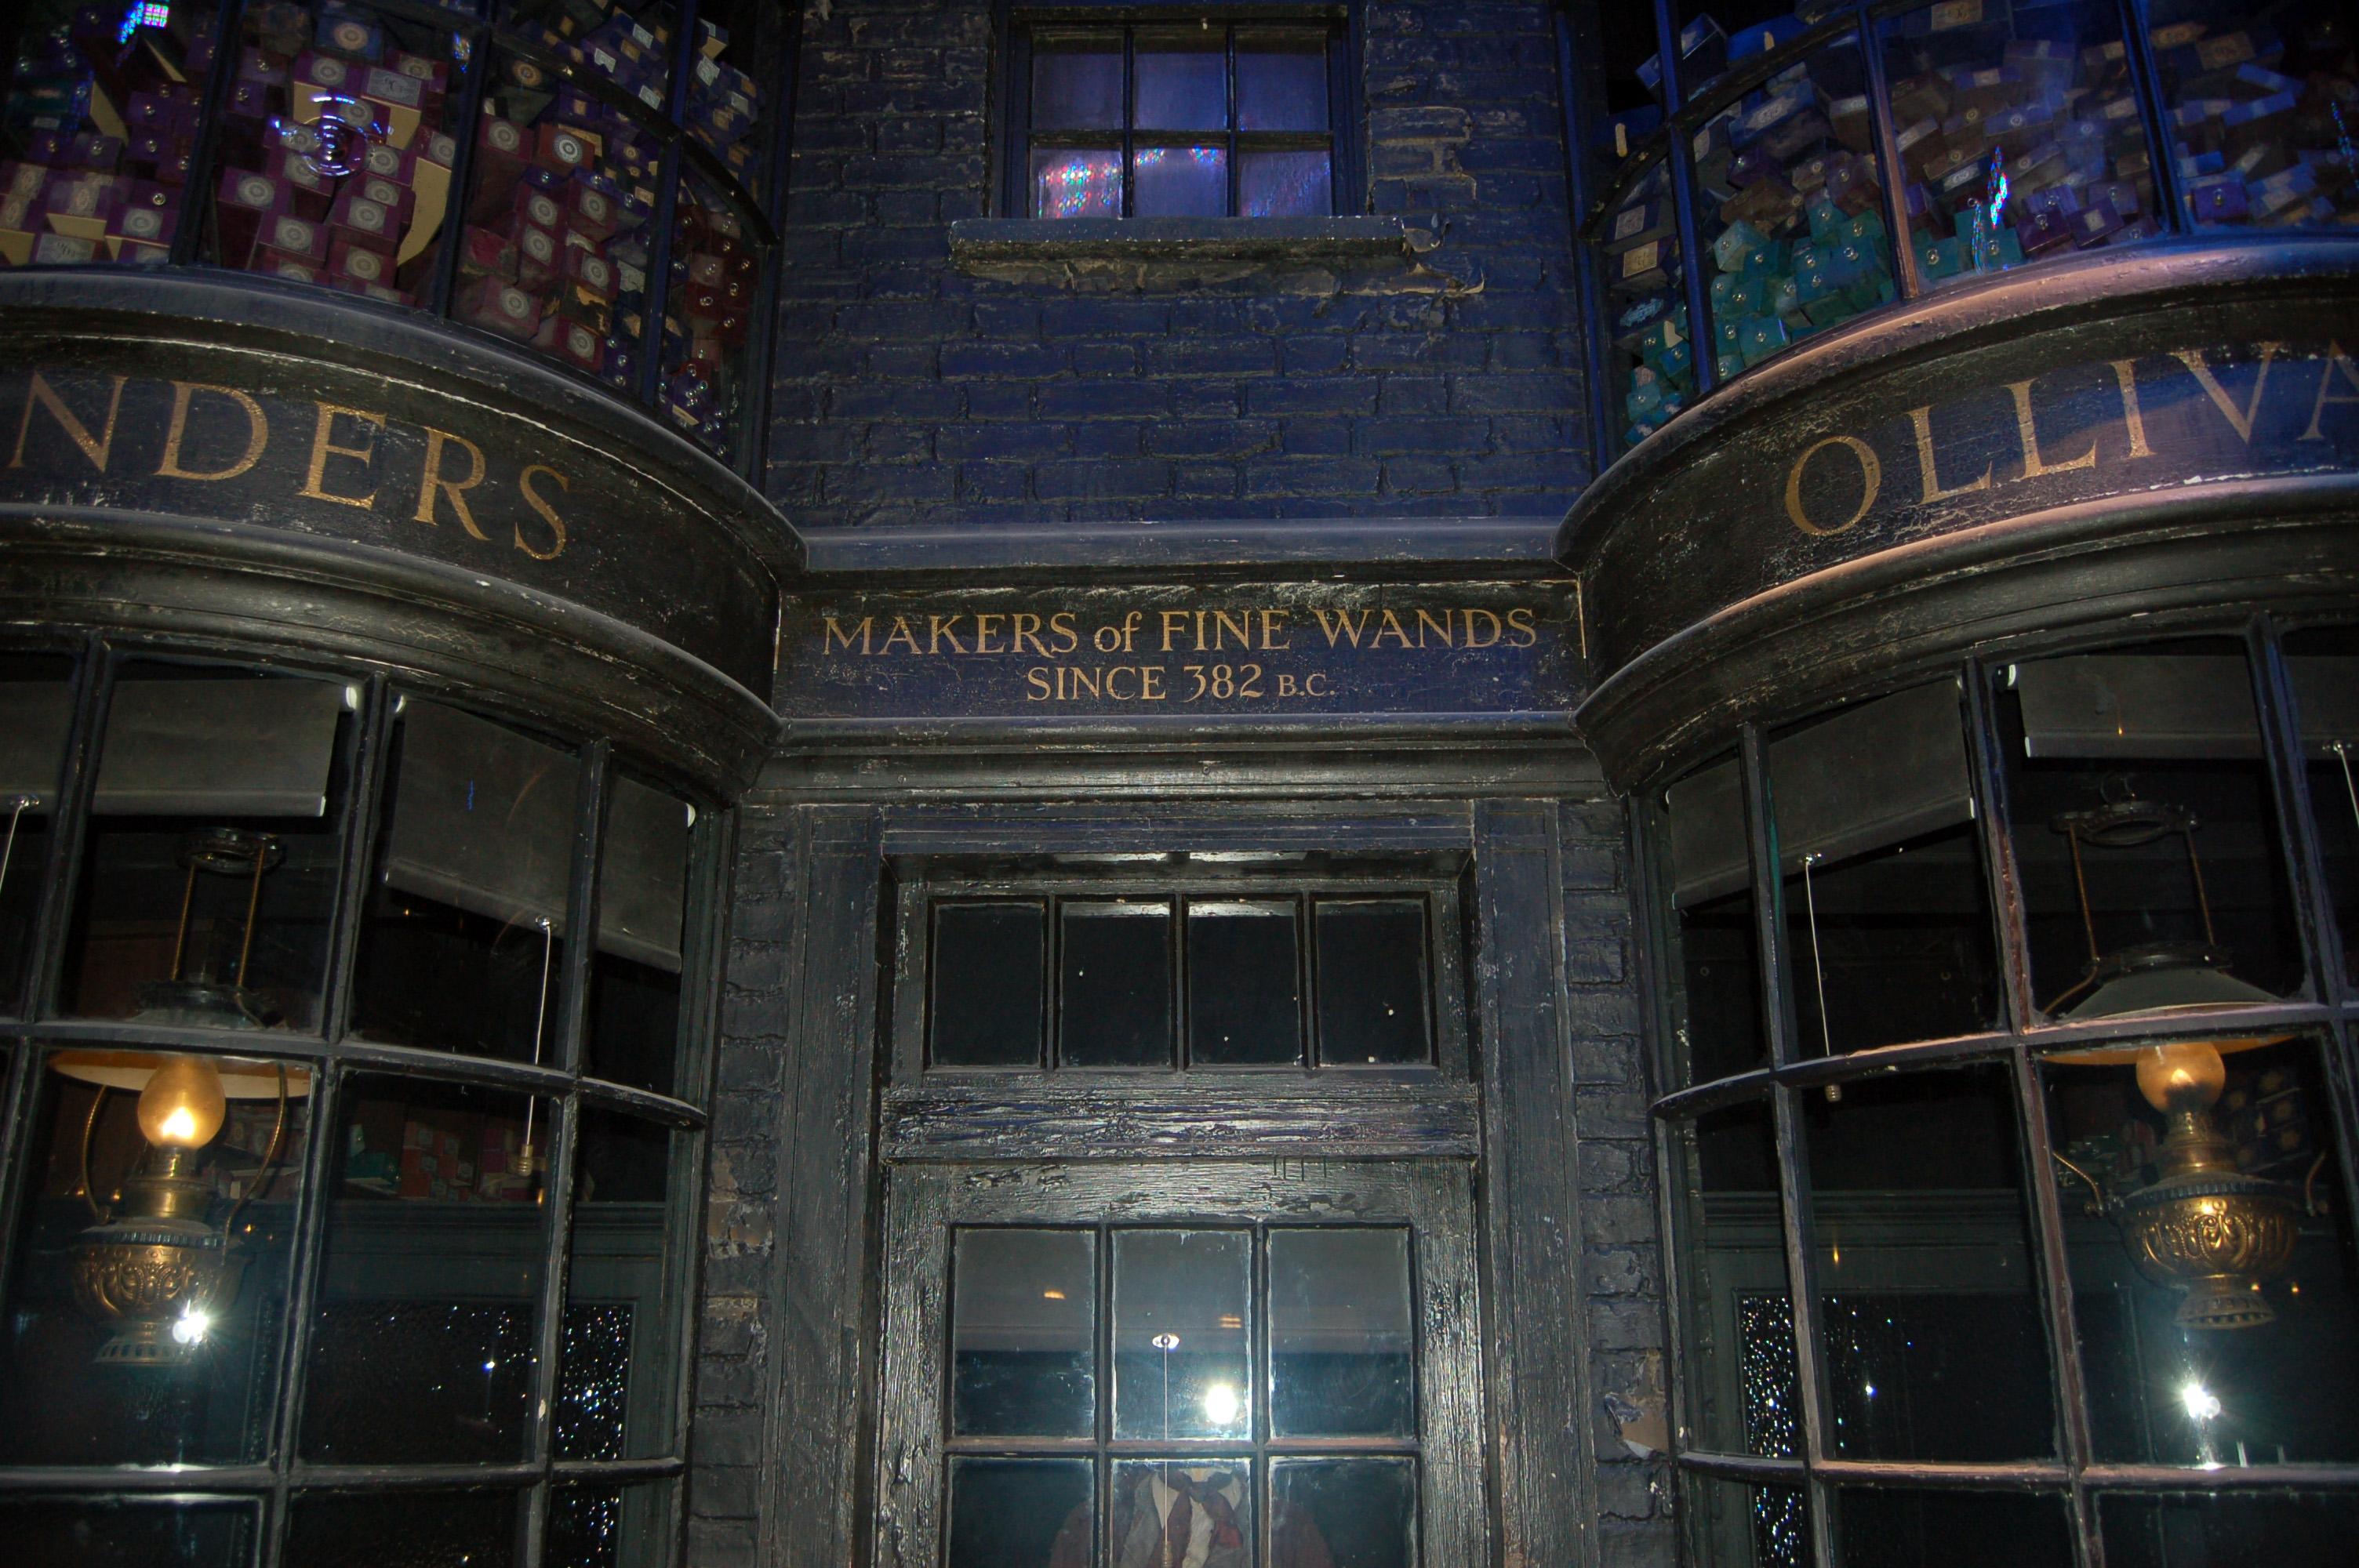 Kingdom Wands